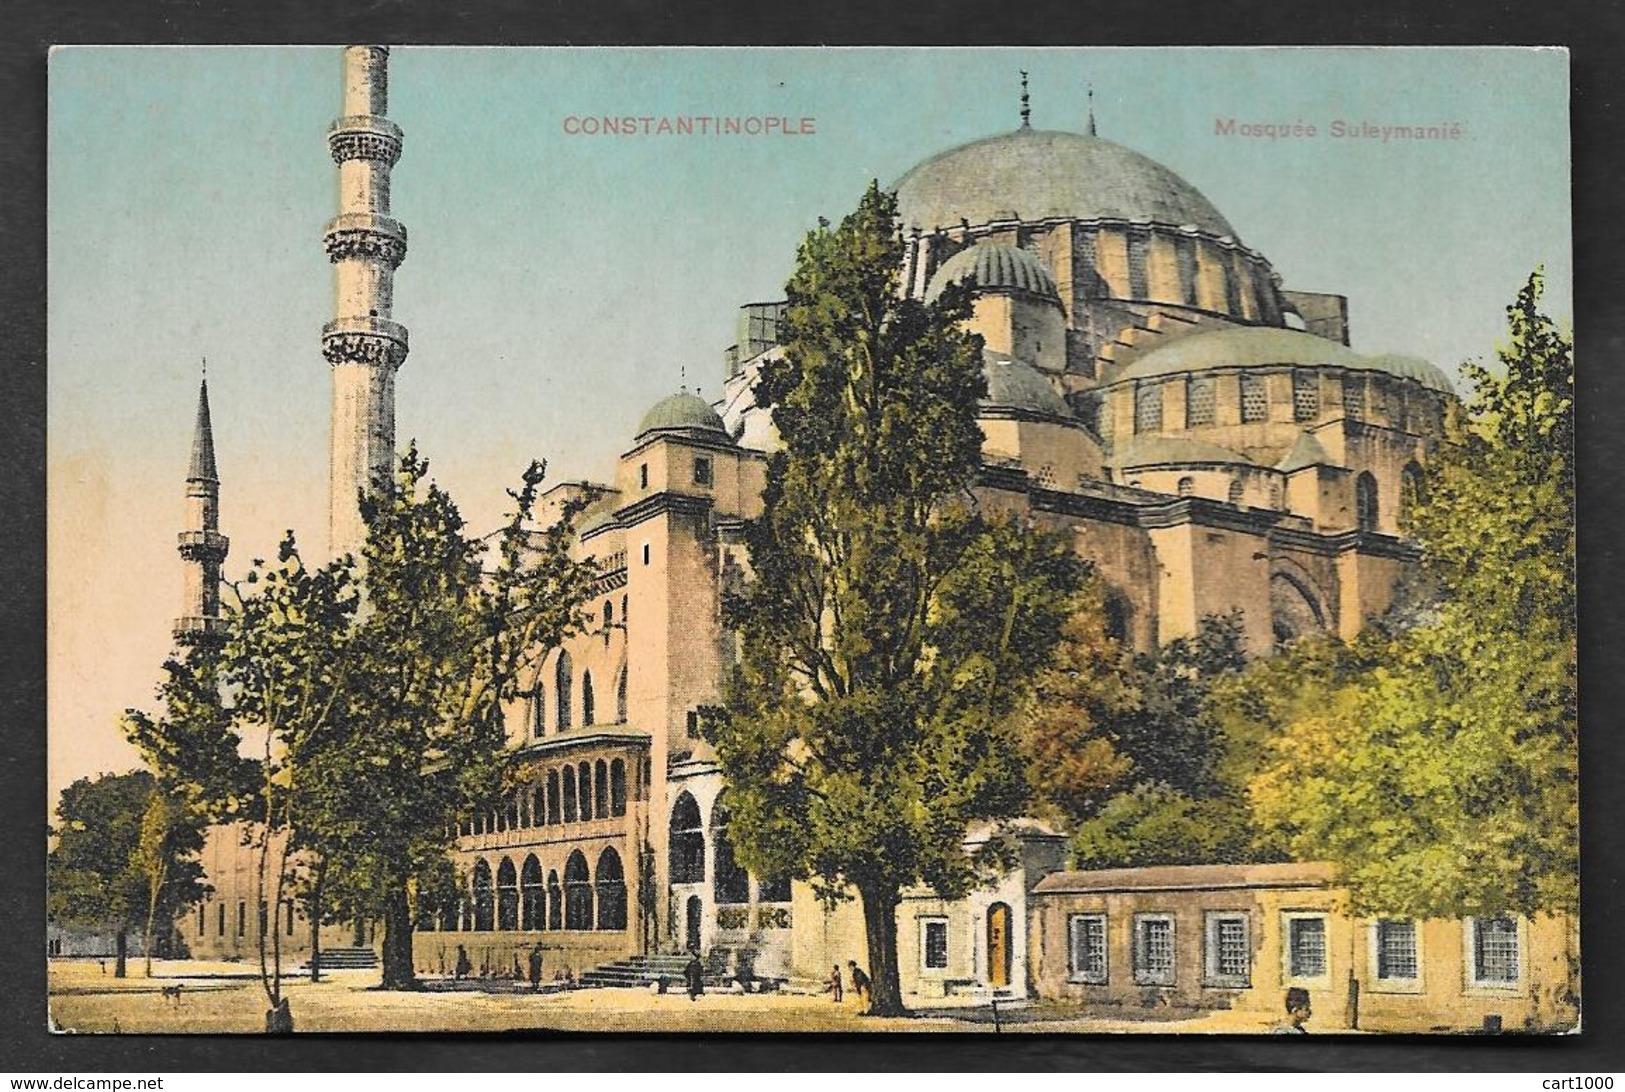 CONSTANTINOPLE MOSQUEE SULEYMANIE UNUSED - Turchia